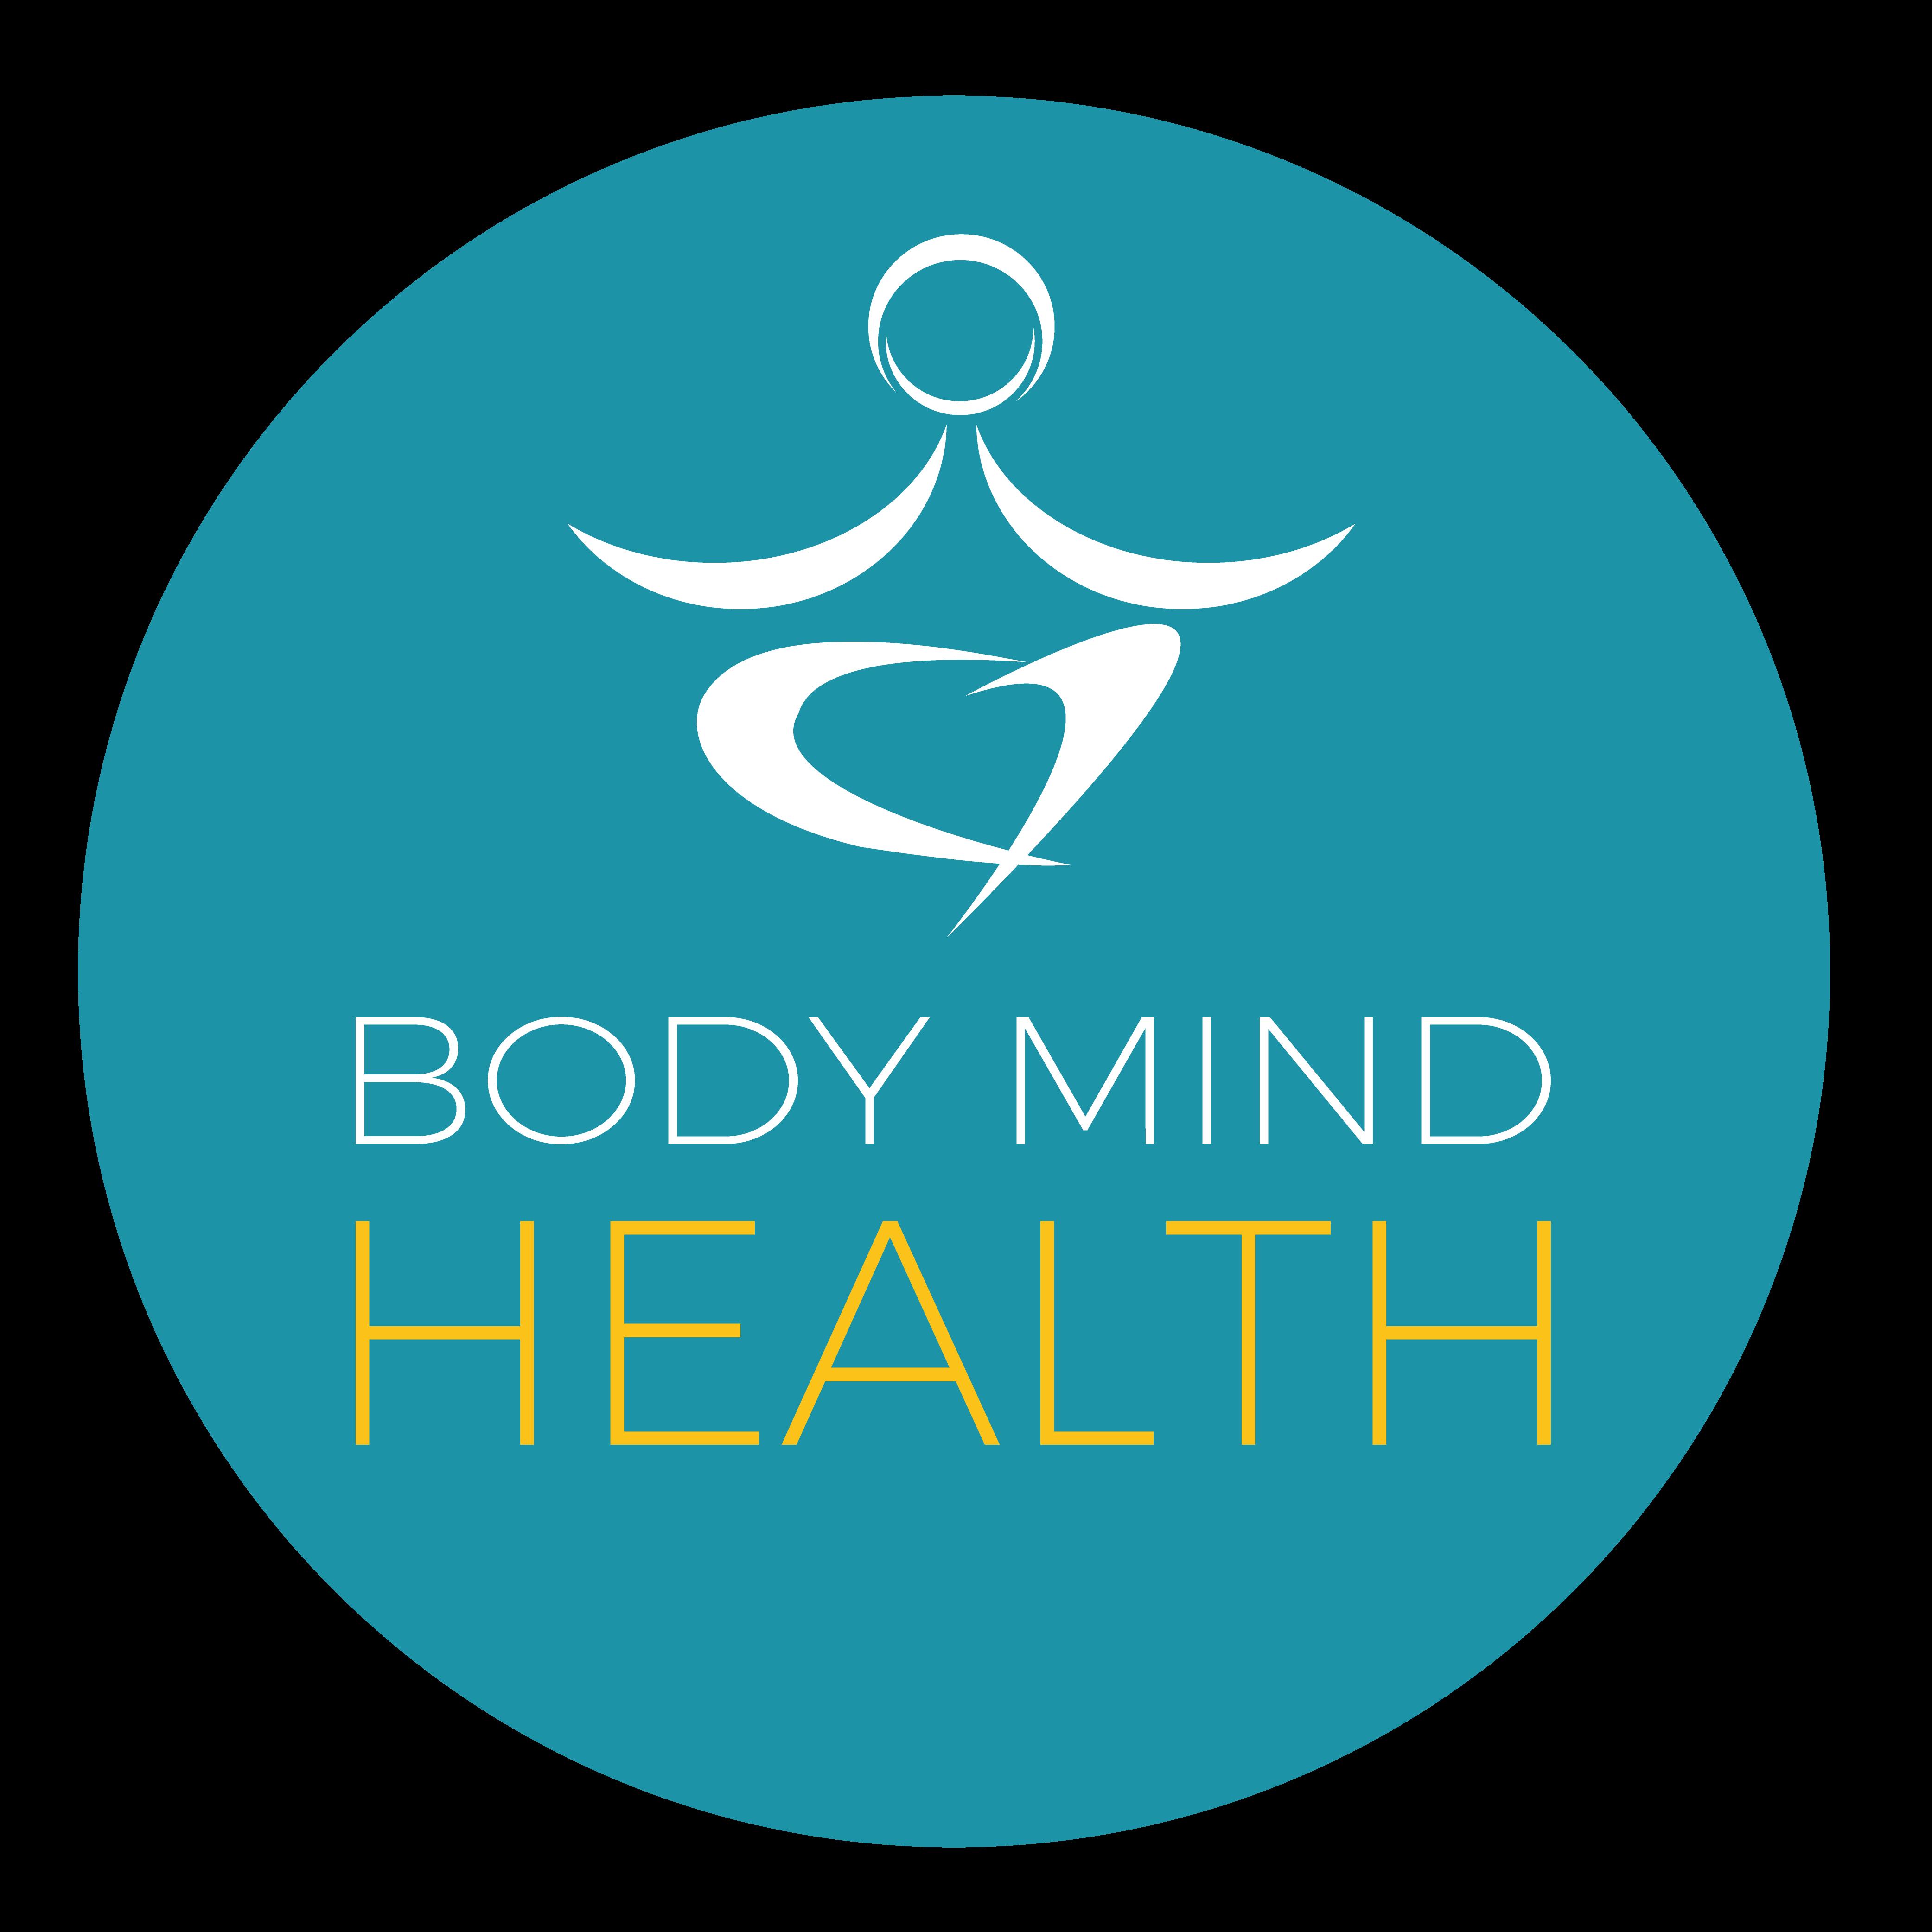 Body Mind Health